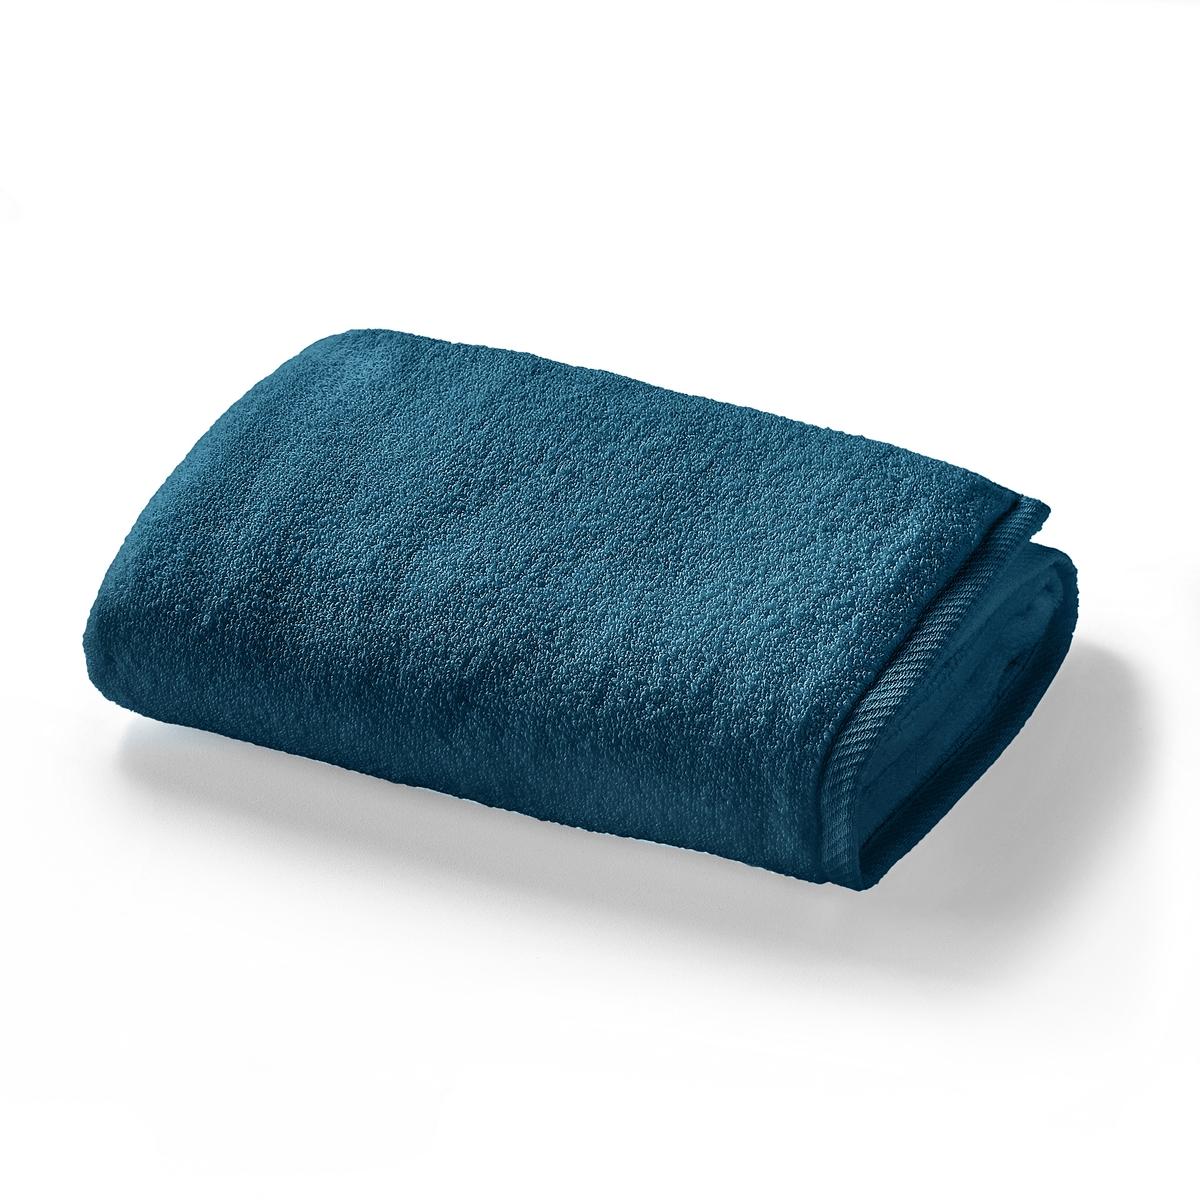 Полотенце La Redoute Махровое 100 хлопок Zro Twist 50 x 90 см синий полотенце proffi home классик цвет шоколадный 50 x 100 см